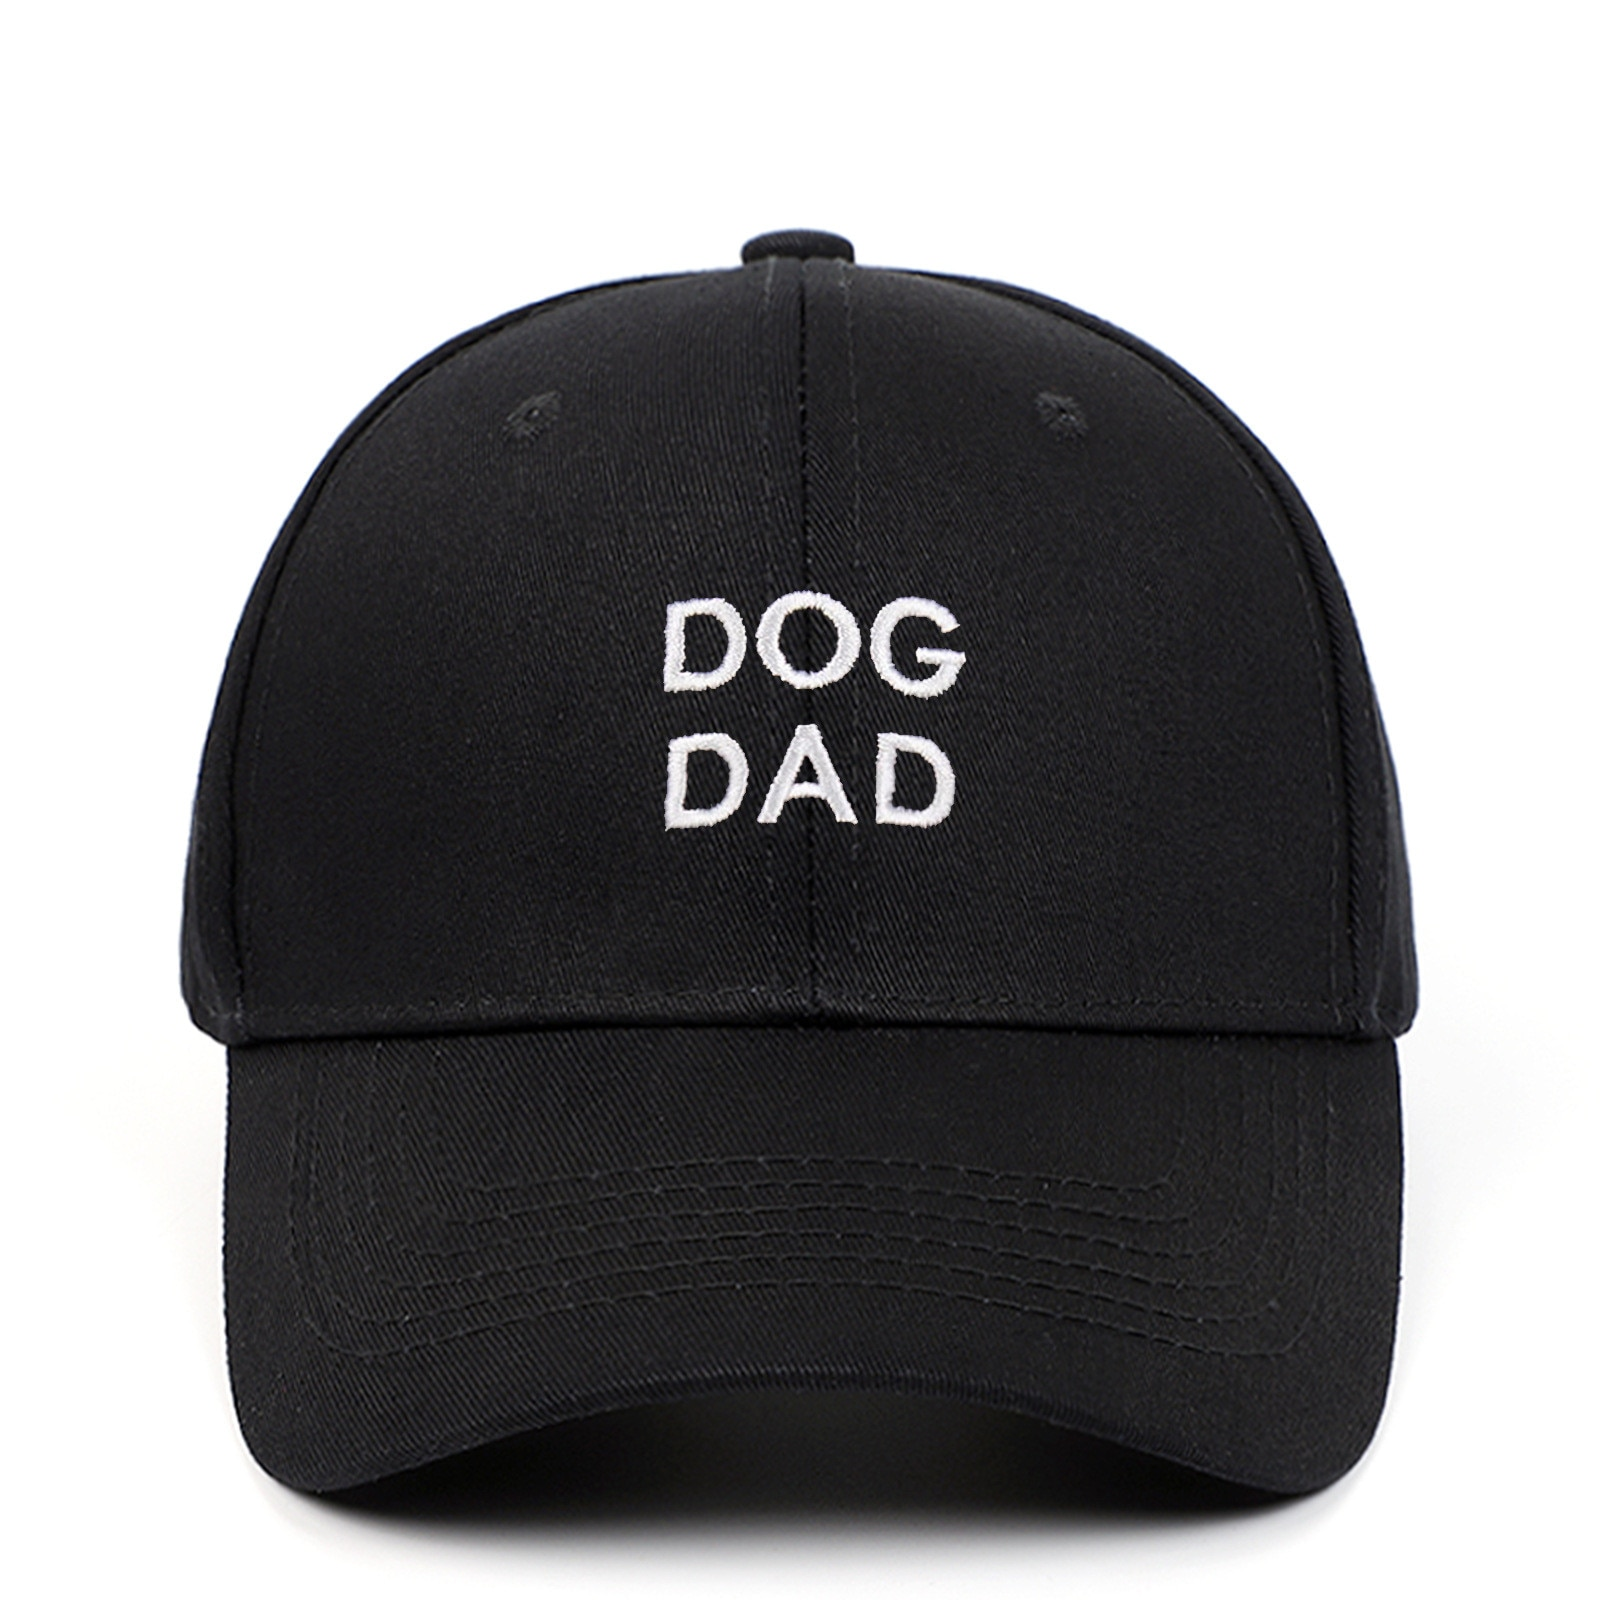 DOG DAD baseball cap hip hop embroidery men dad hat outdoor sports hiphop snapack hat cotton kpop cu